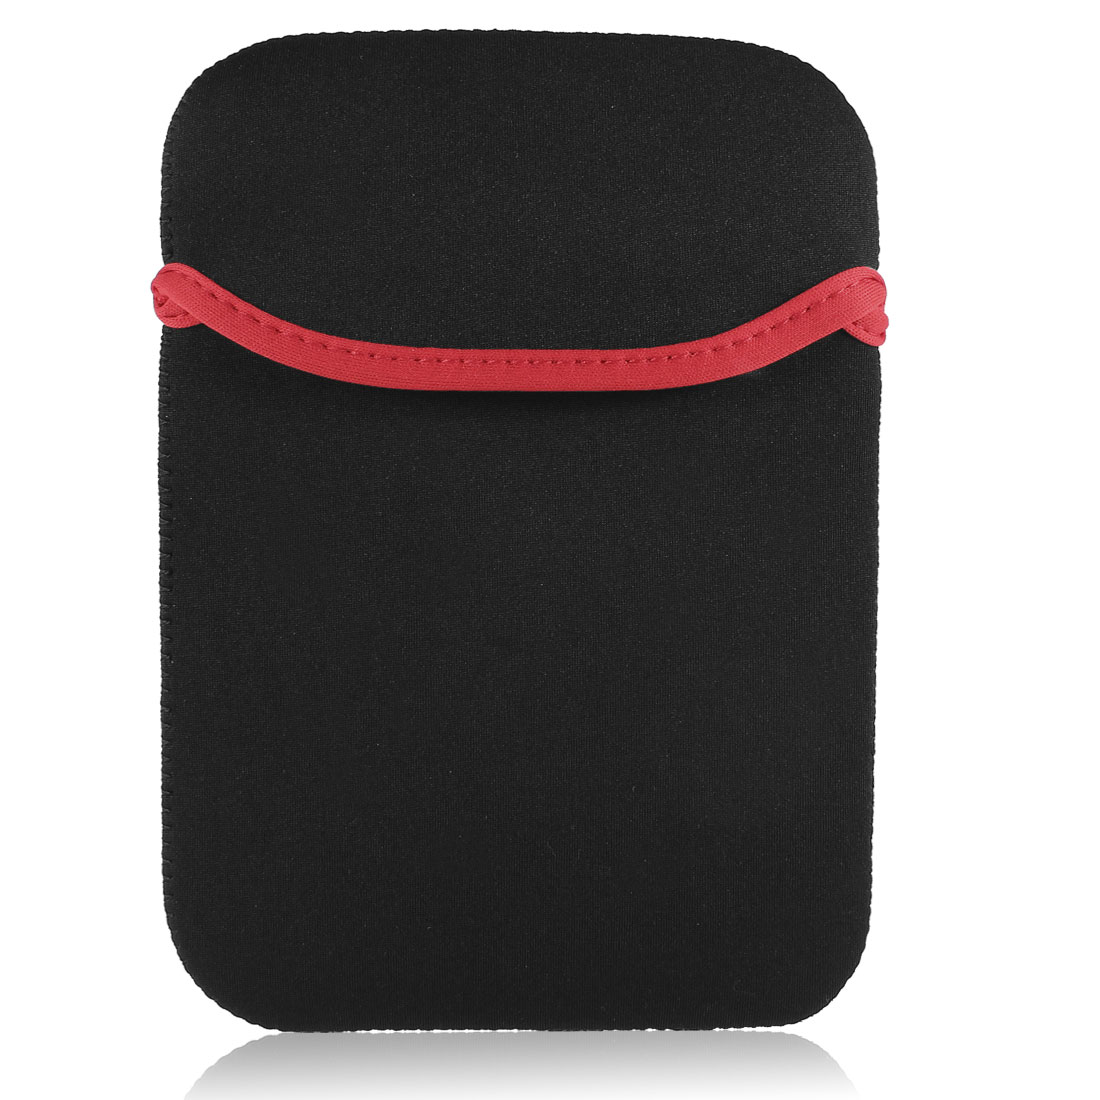 "Red Black Neoprene 7"" Tablet Sleeve Bag for Google Nexus7 2nd"